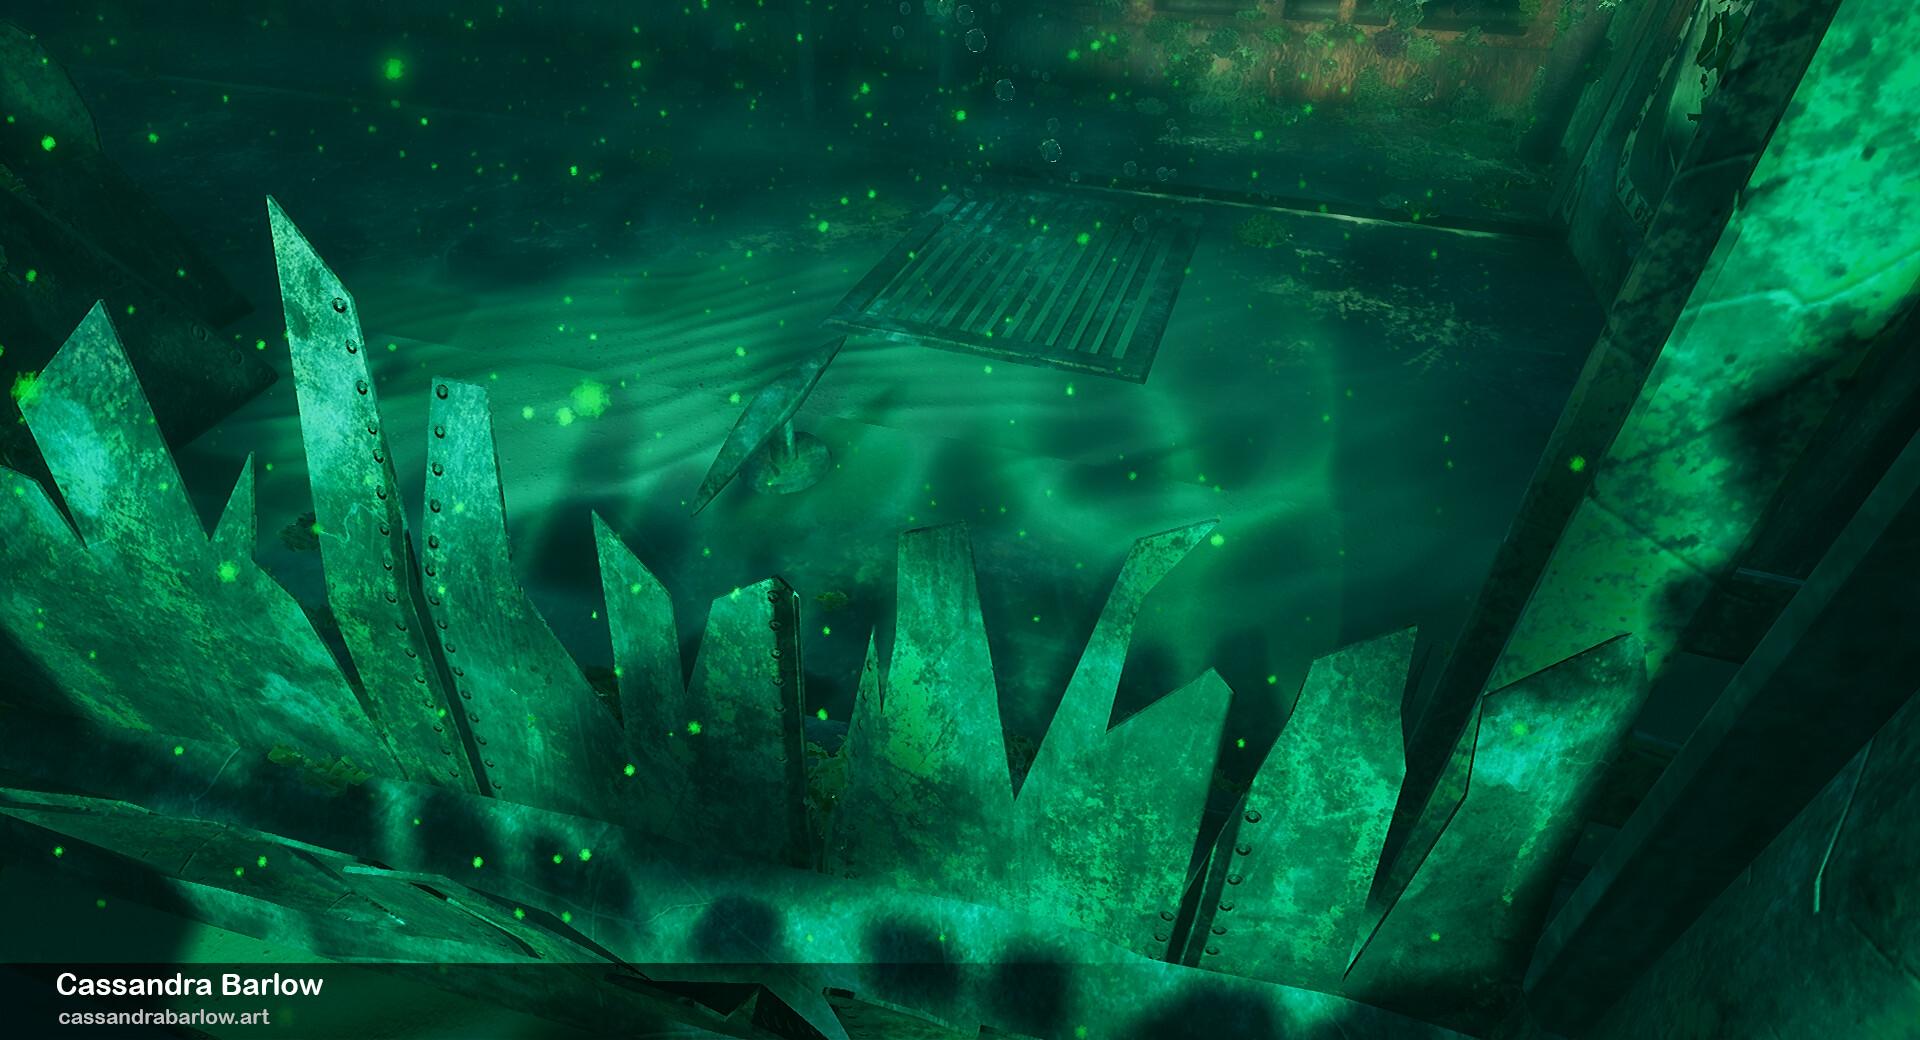 Cassandra barlow cassandrabarlow submarinewreck 2